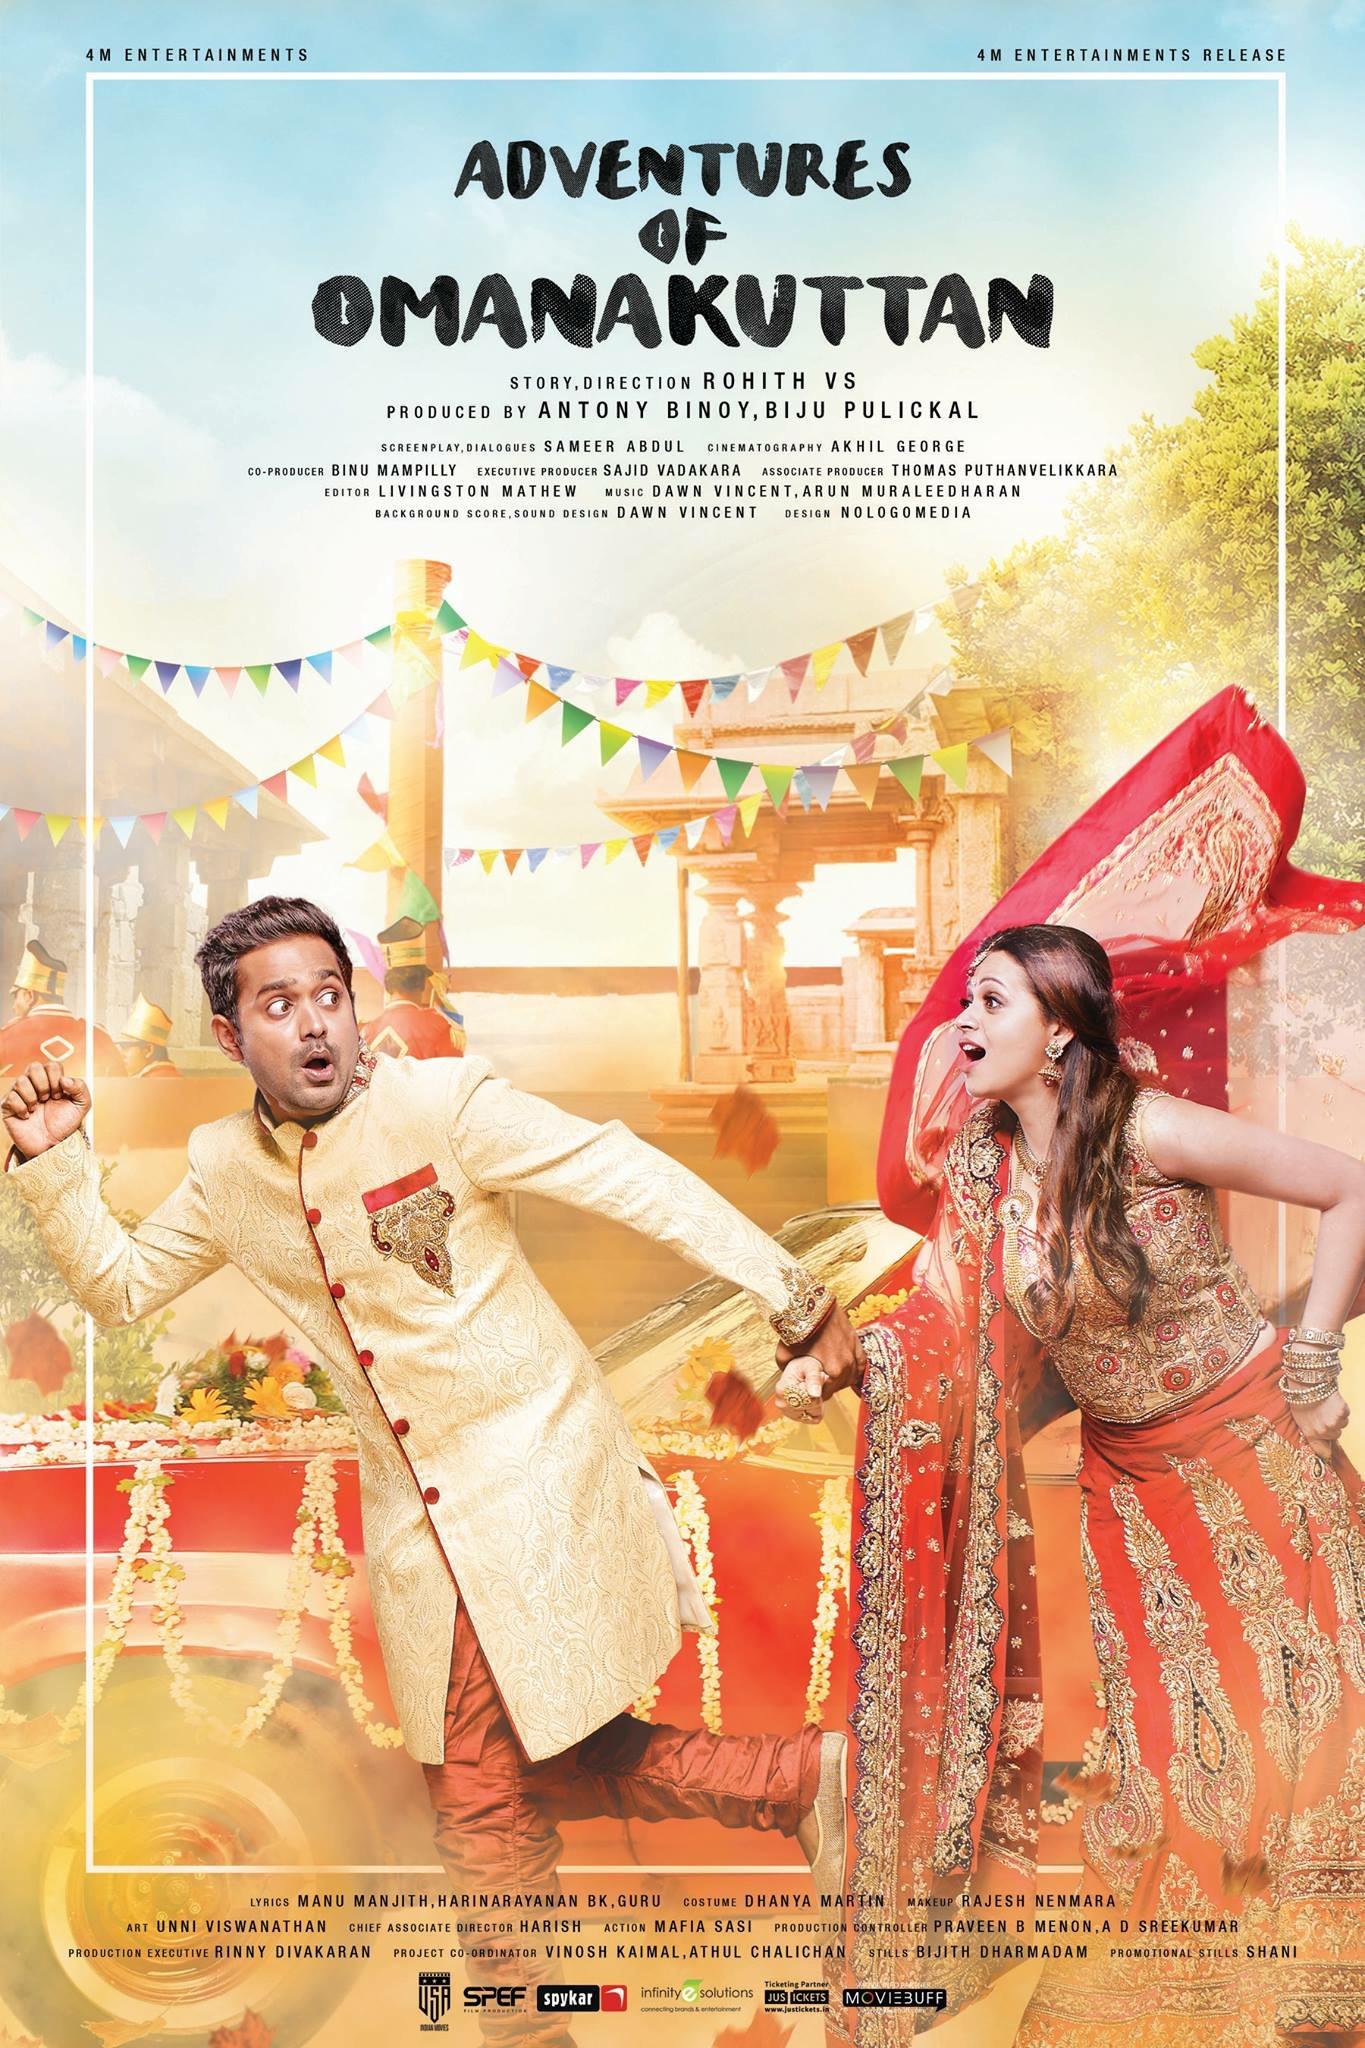 Adventures of Omanakuttan 2017 Dual Audio Hindi 1080p UNCUT HDRip 3.4GB Download